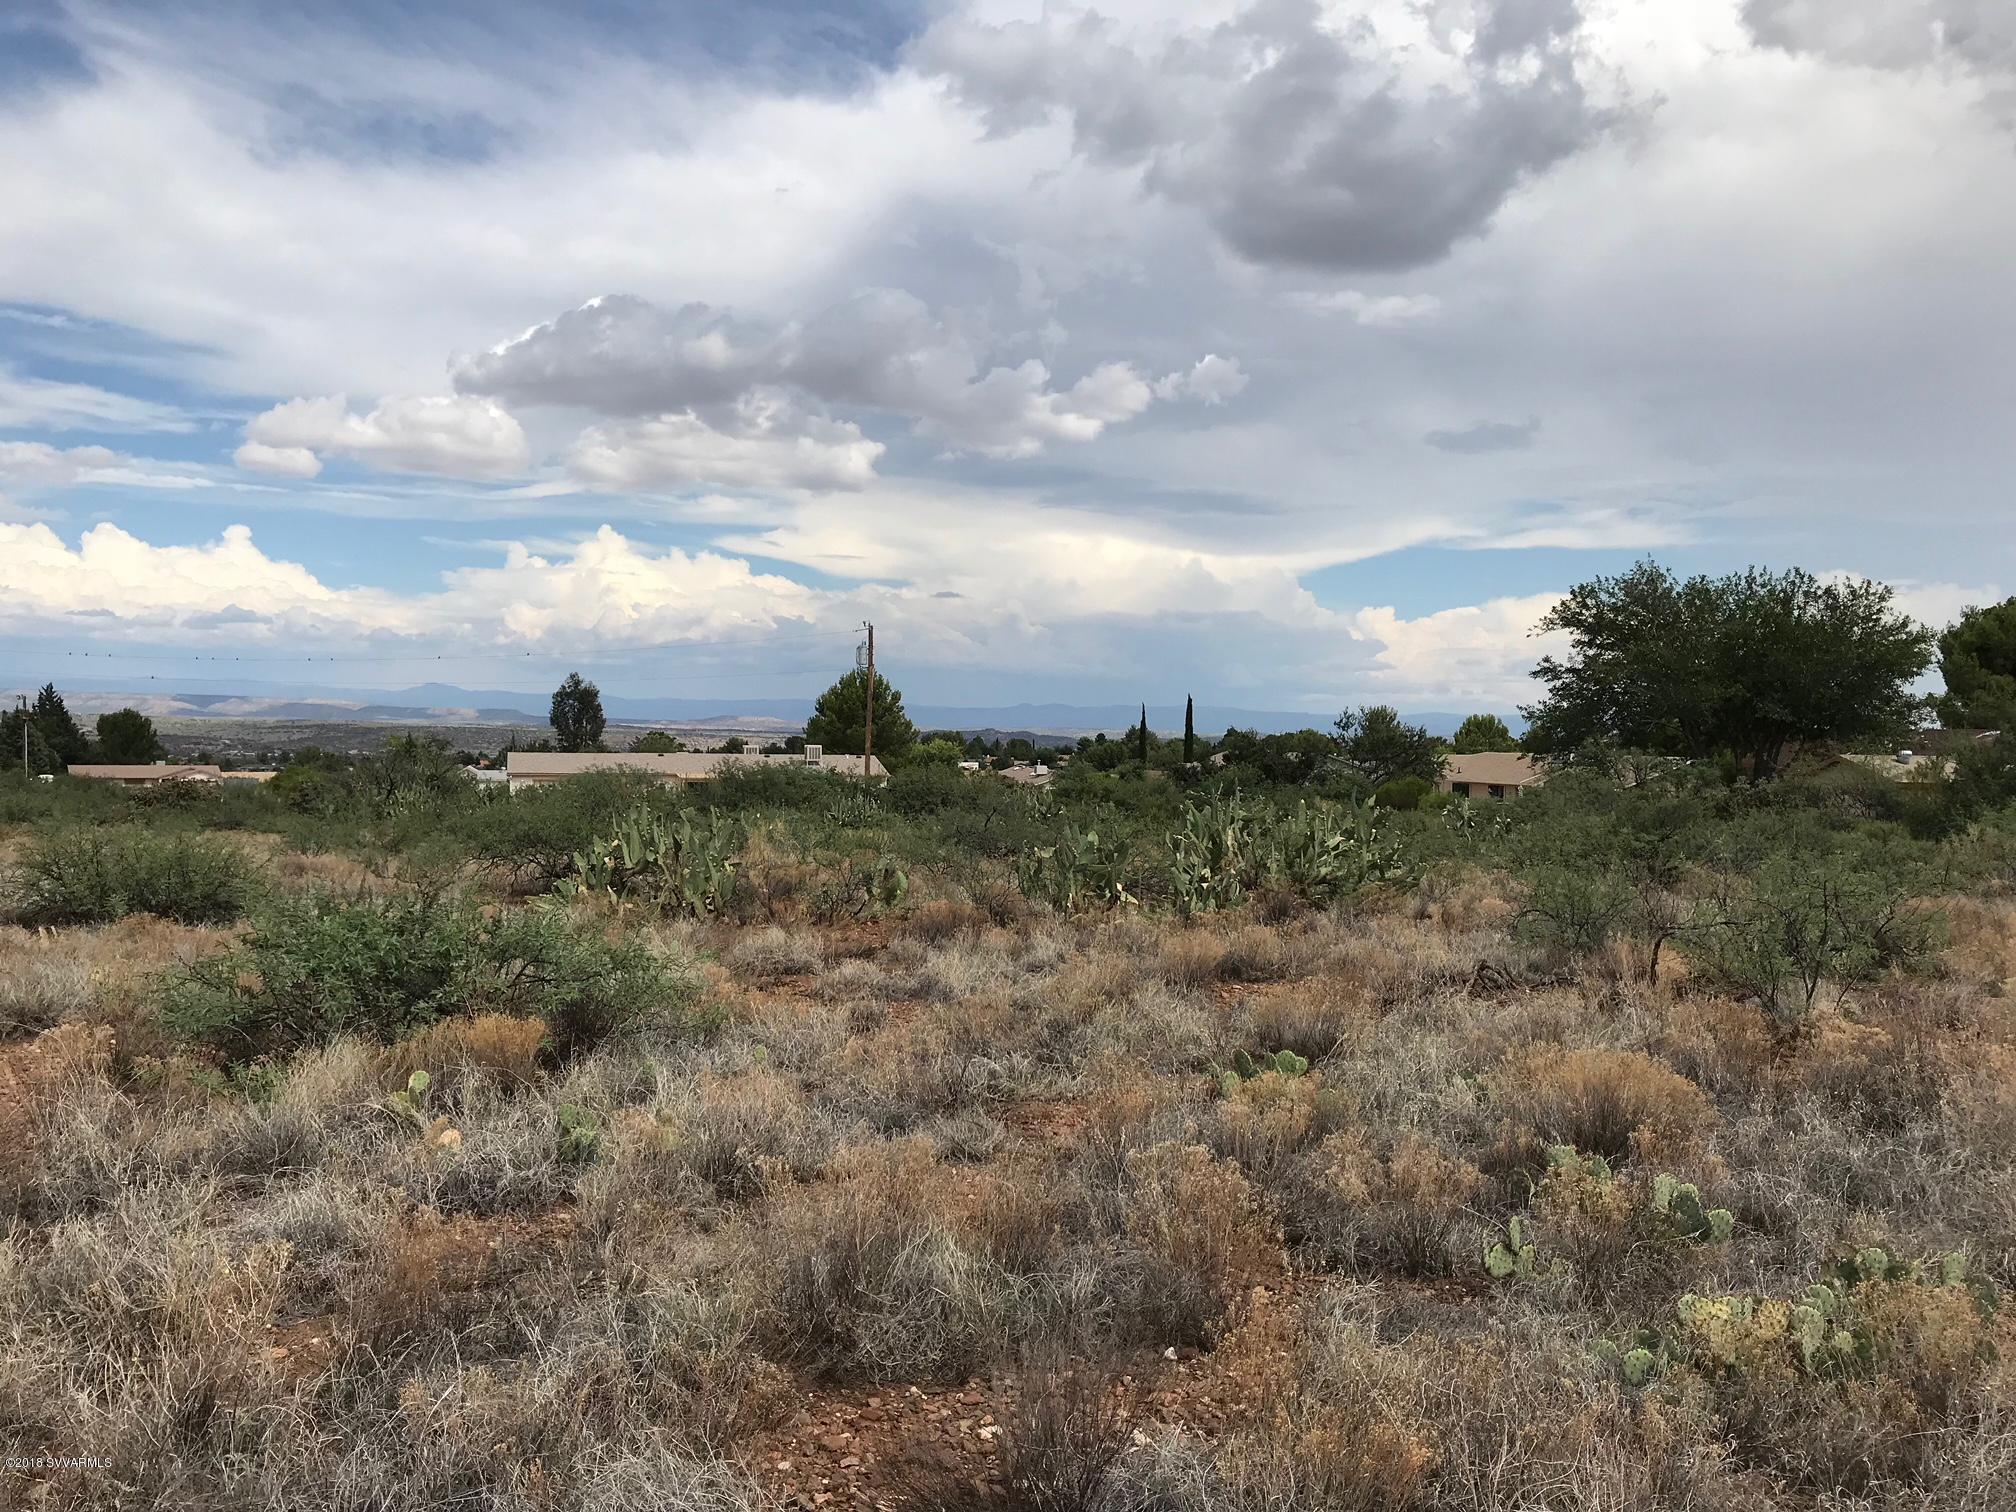 1710 S Rainbow Cottonwood, AZ 86326